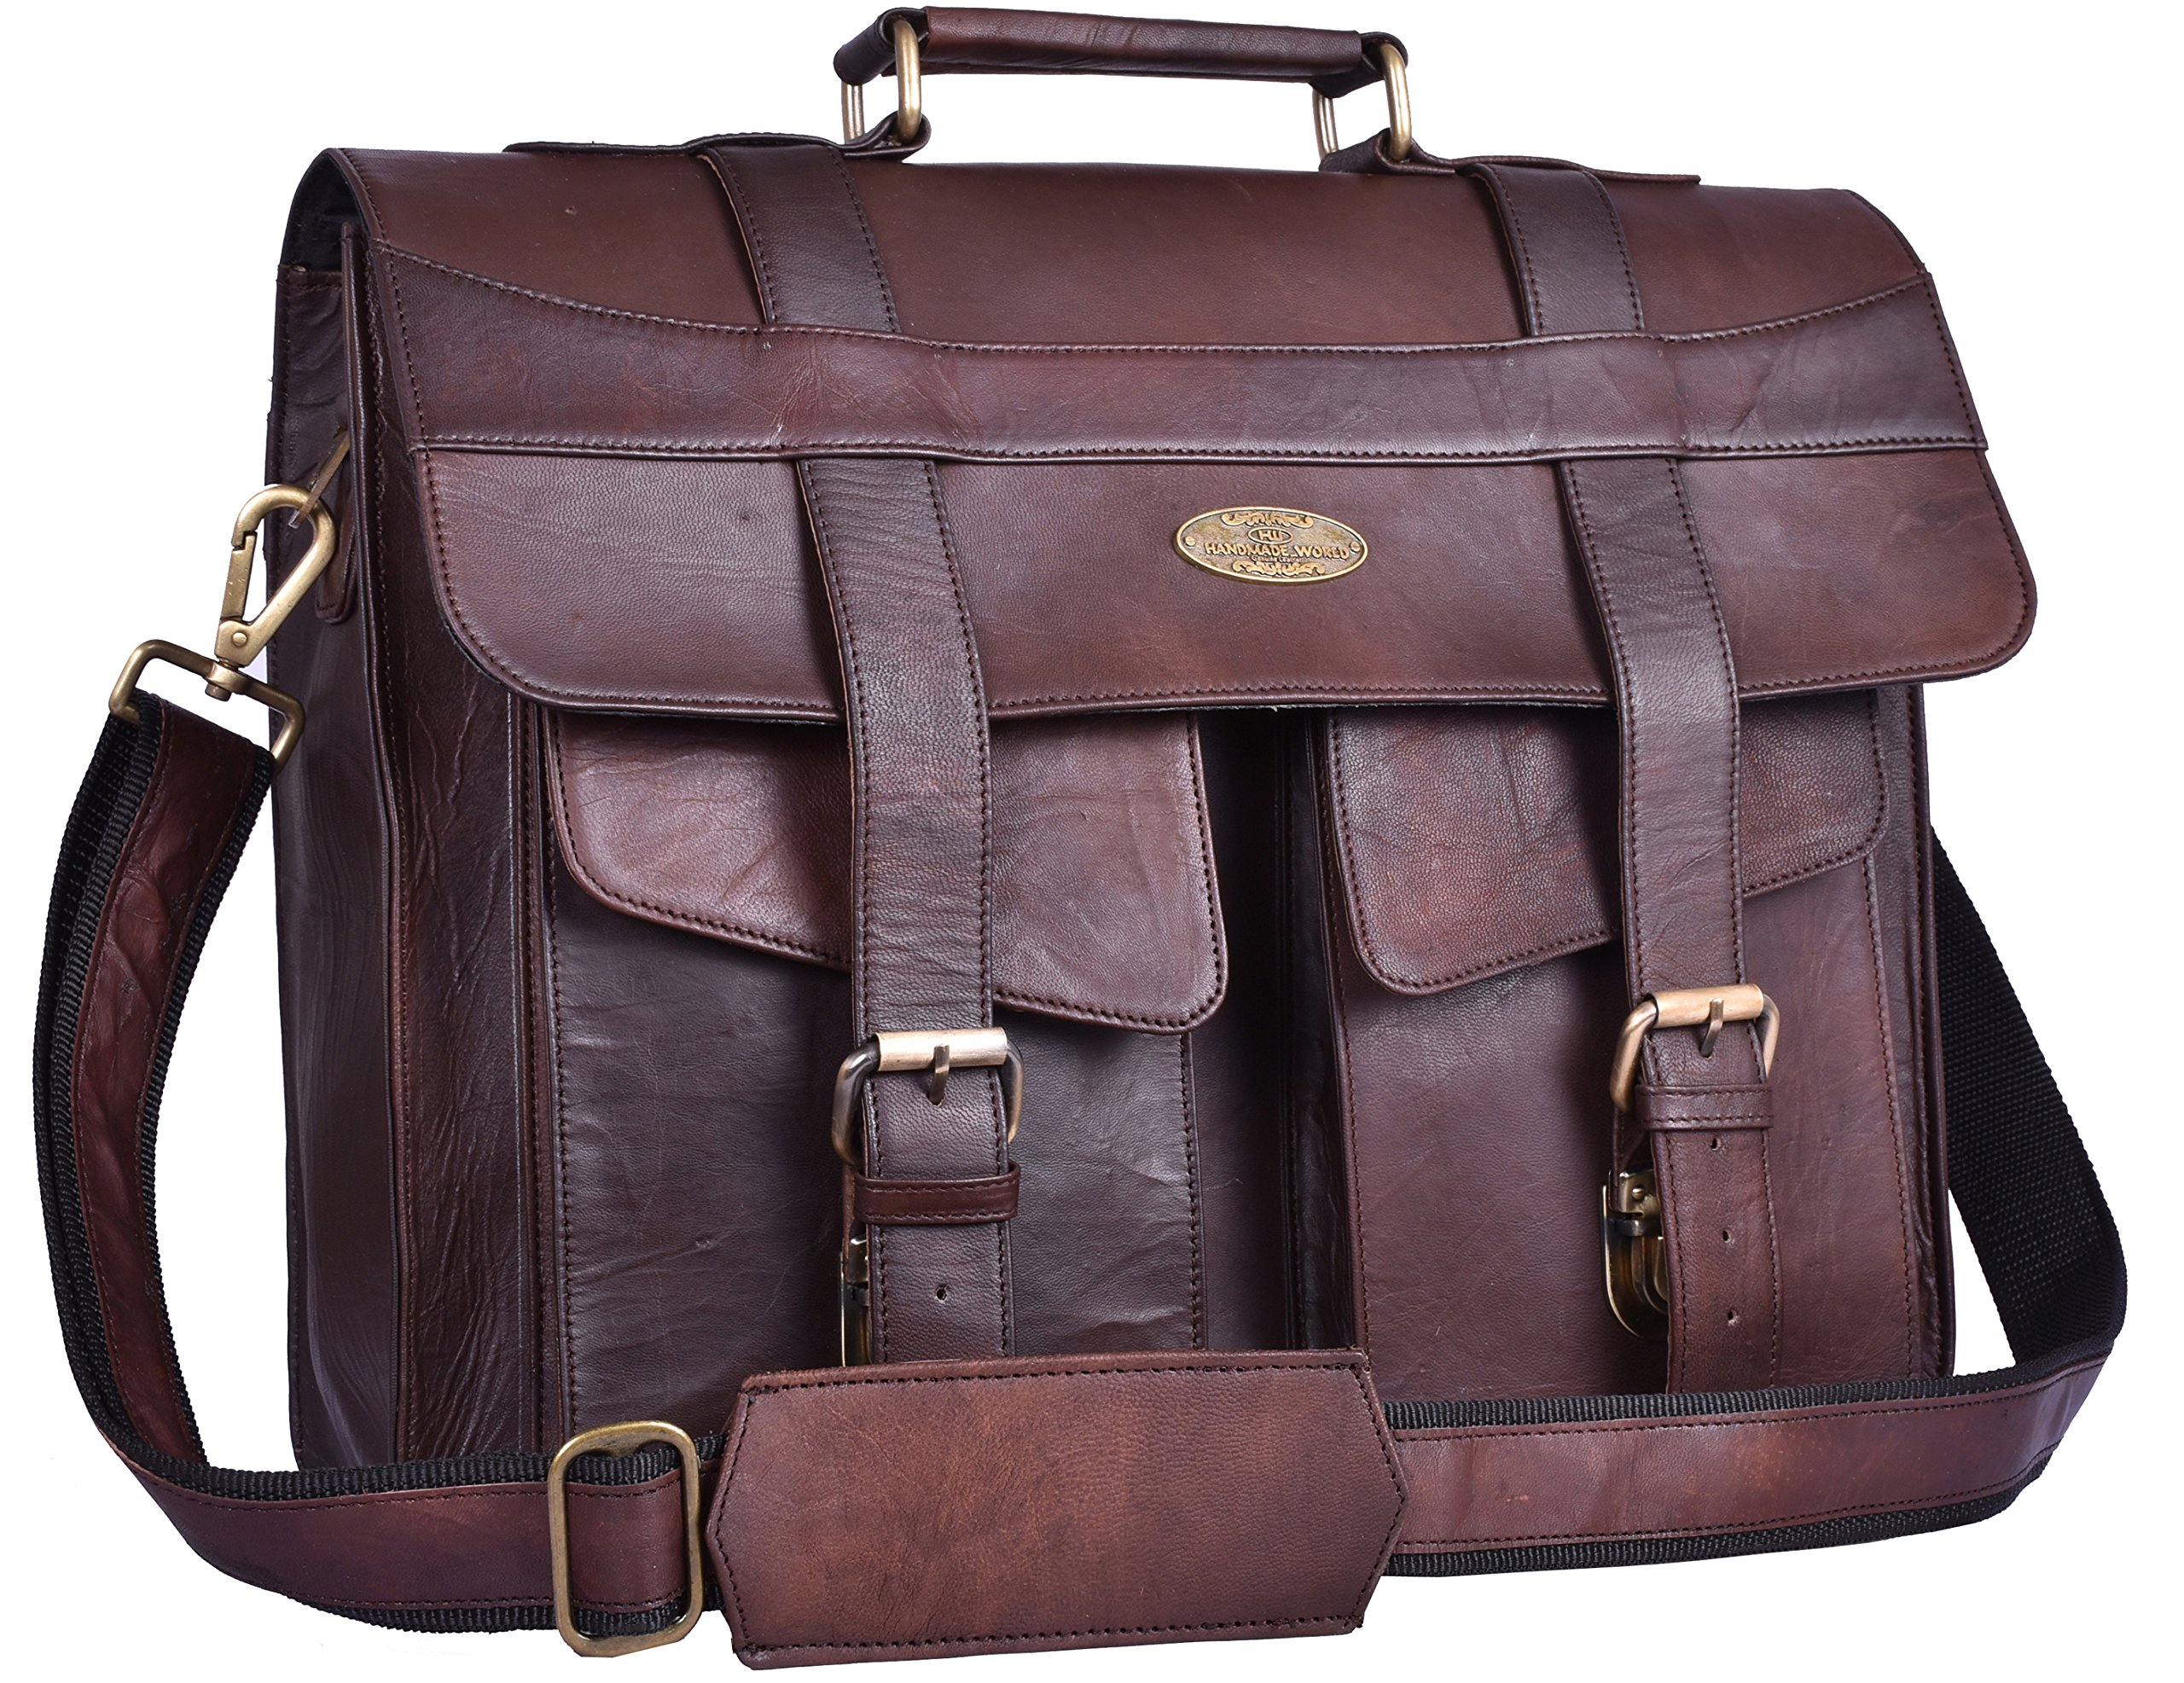 Handmade World Leather Briefcase for Men Women Messenger Bags 16 Inch Brown Vintage Distressed Look Best Laptop Computer Satchel School Bag